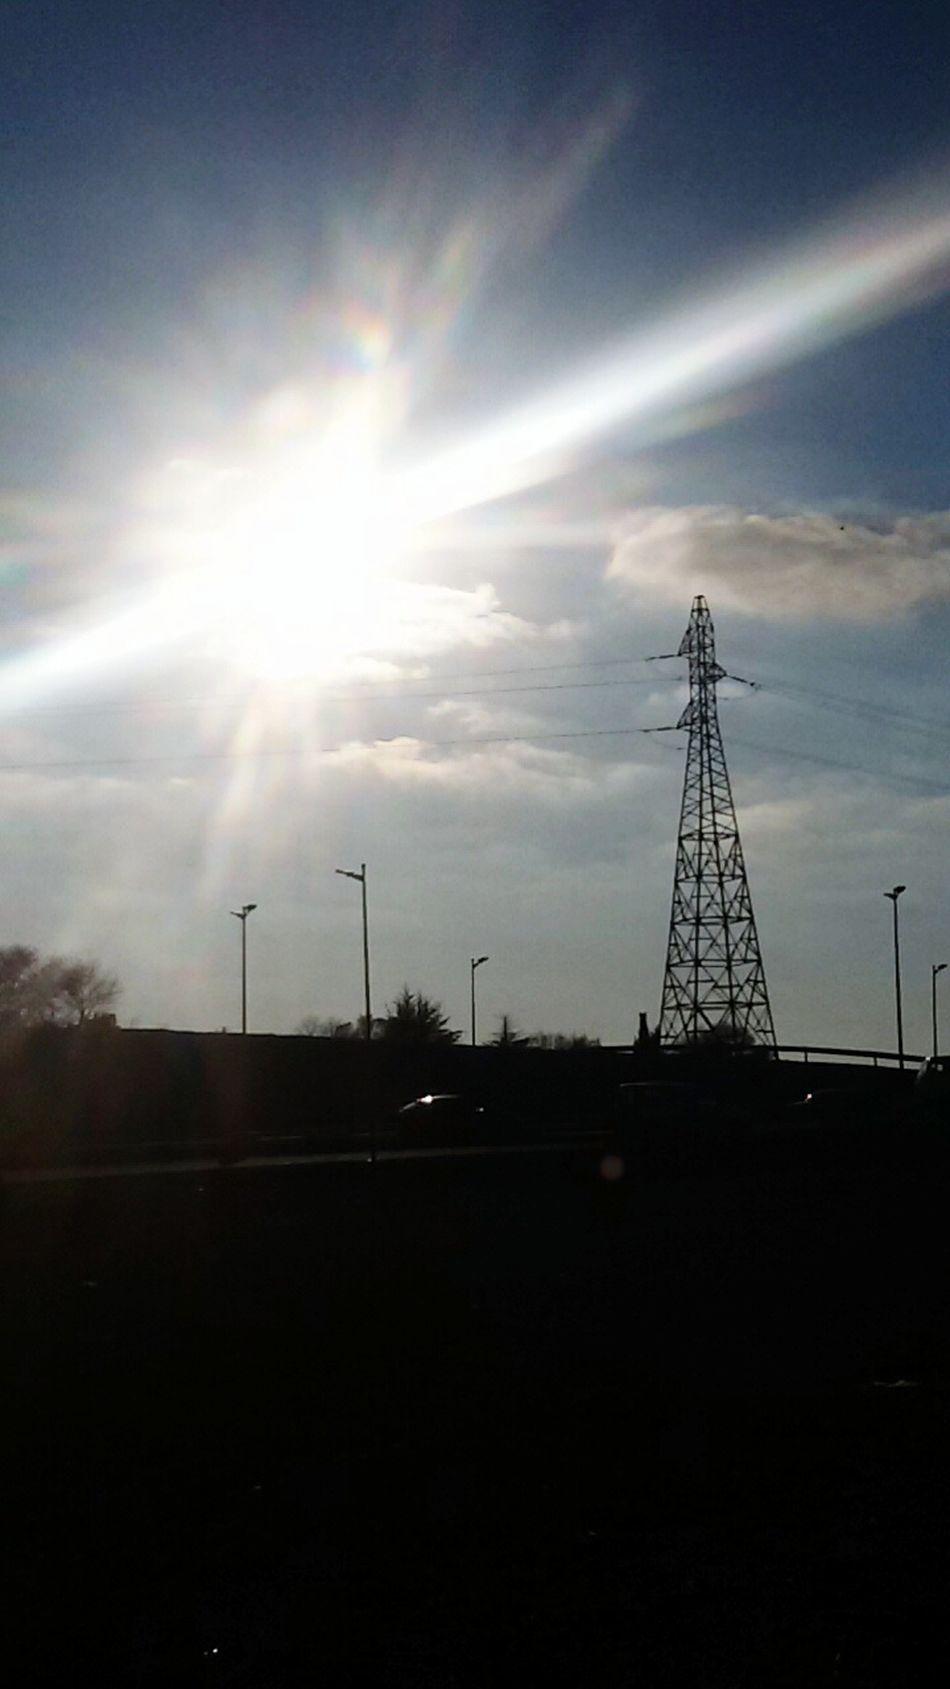 Sunlight No People WeekOnEyeEm Taking Photos Sun Day Electric Tower